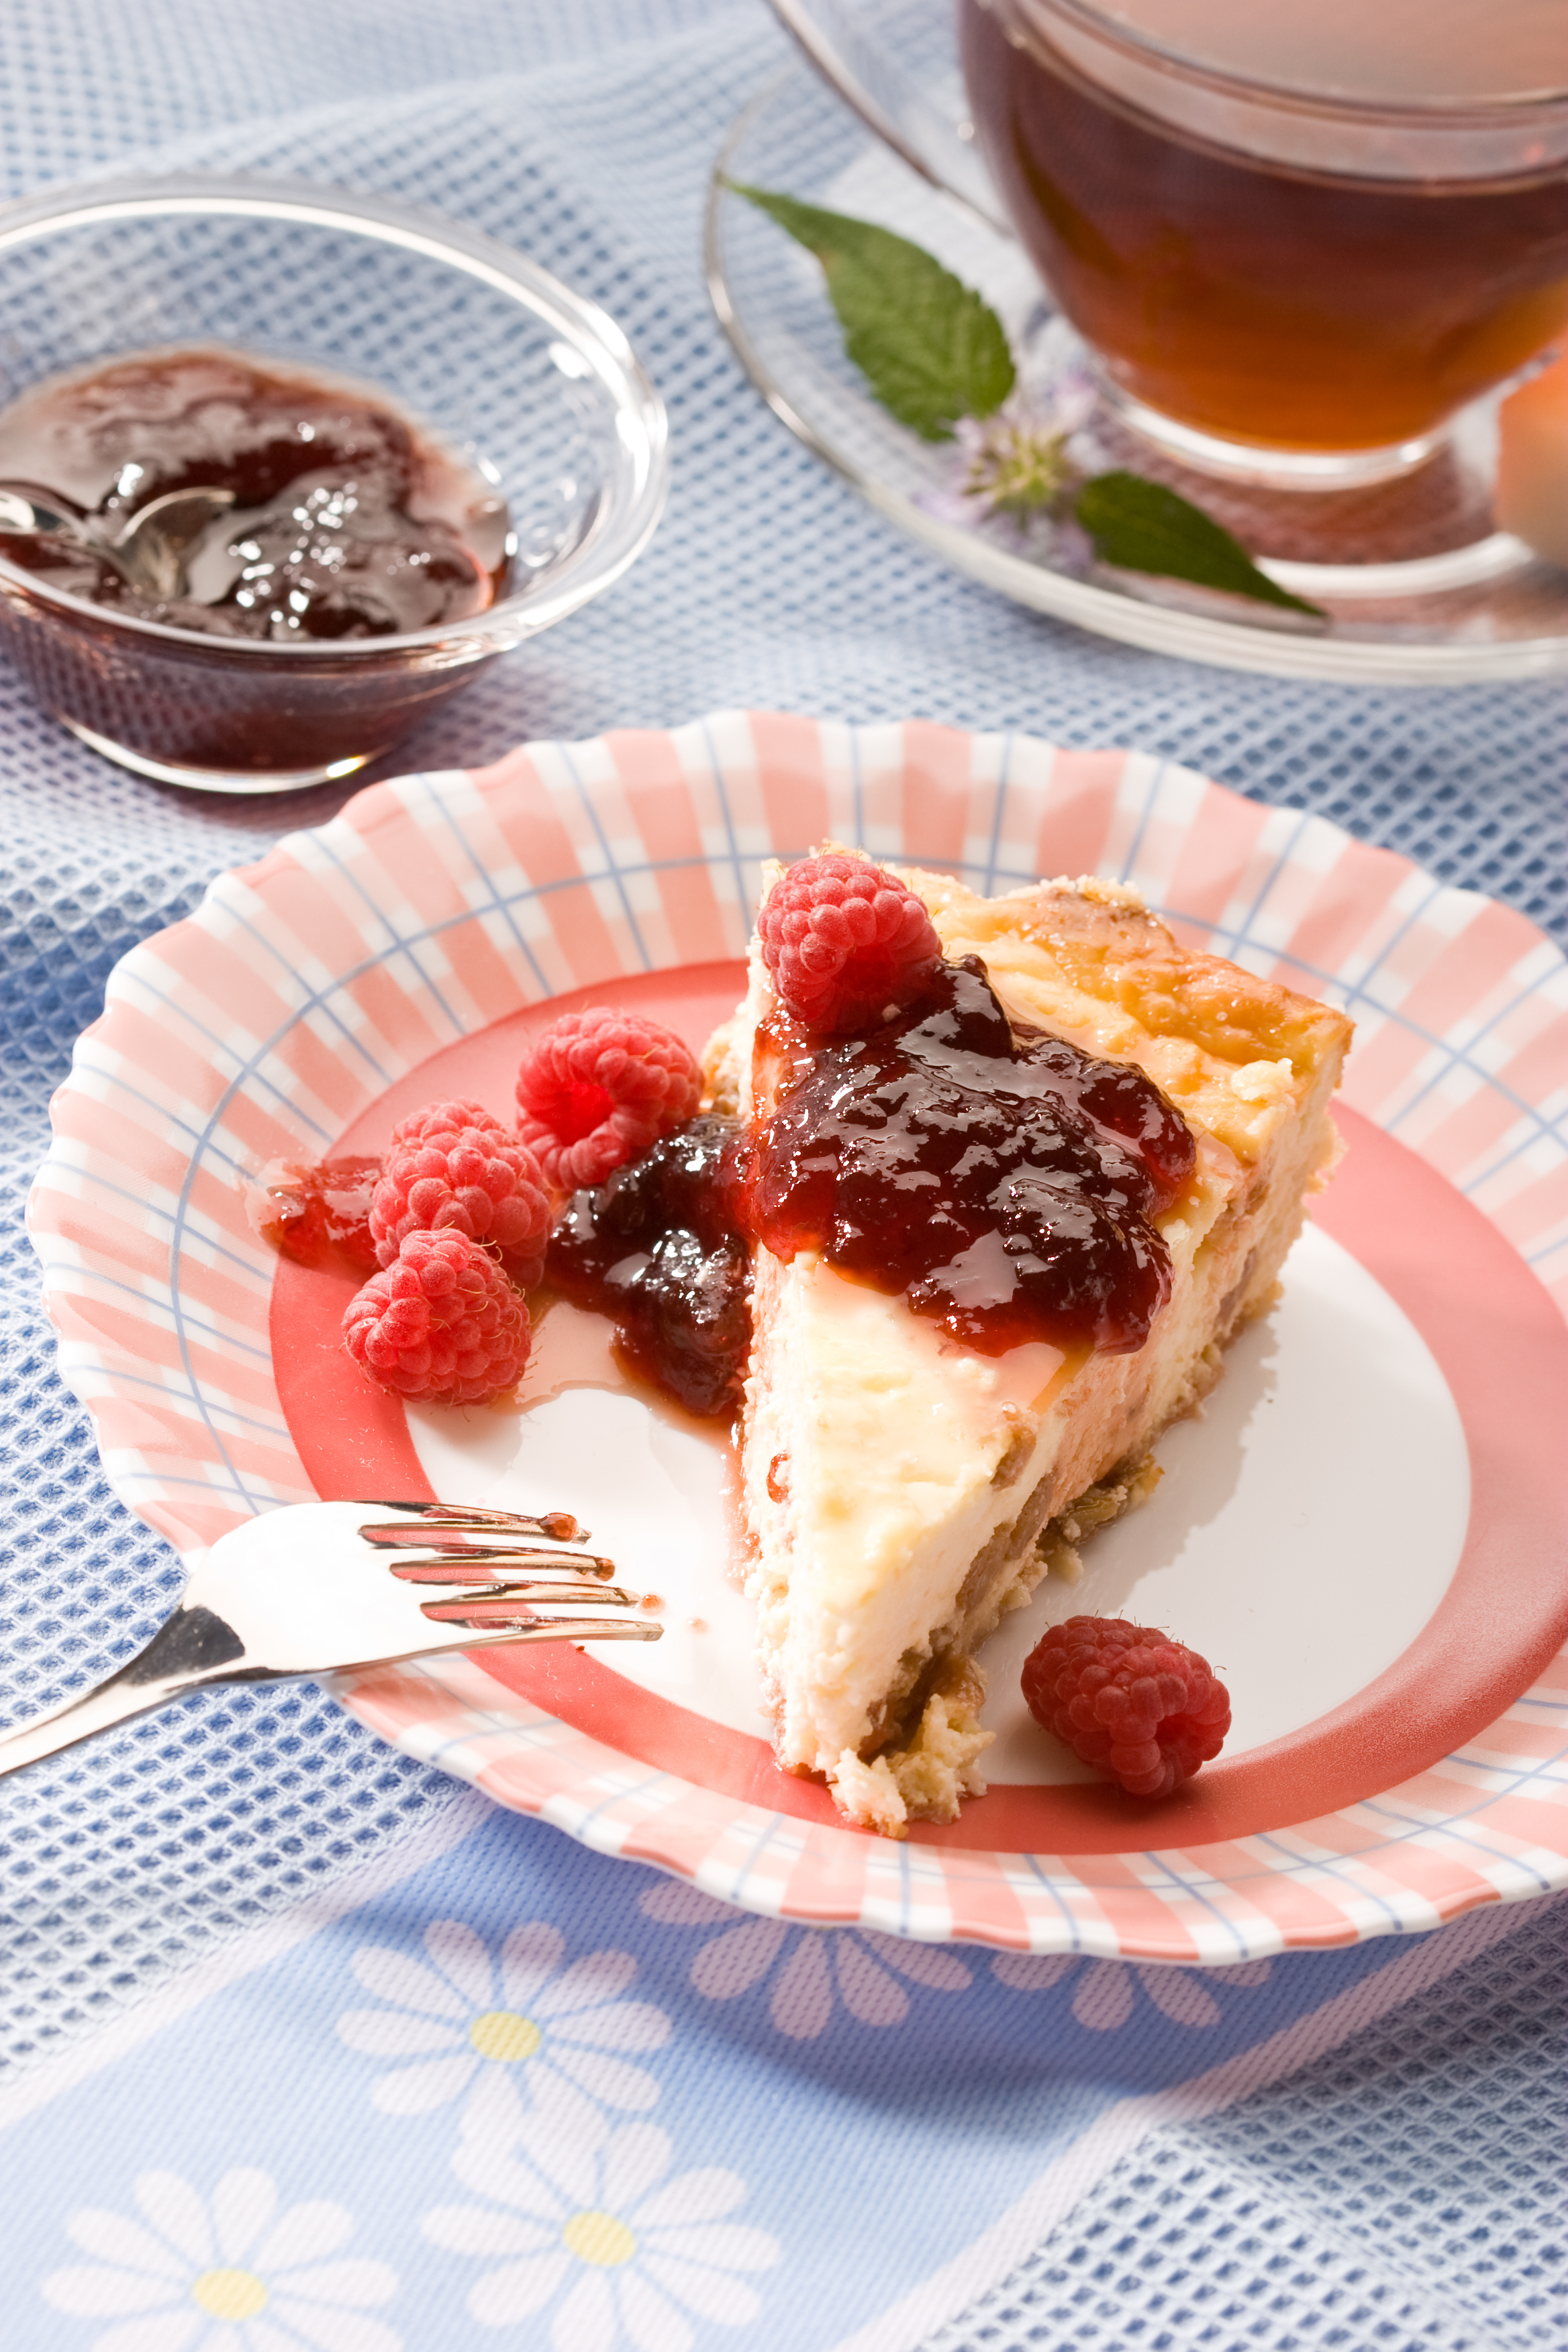 Tarta de queso con mermelada de frambuesa